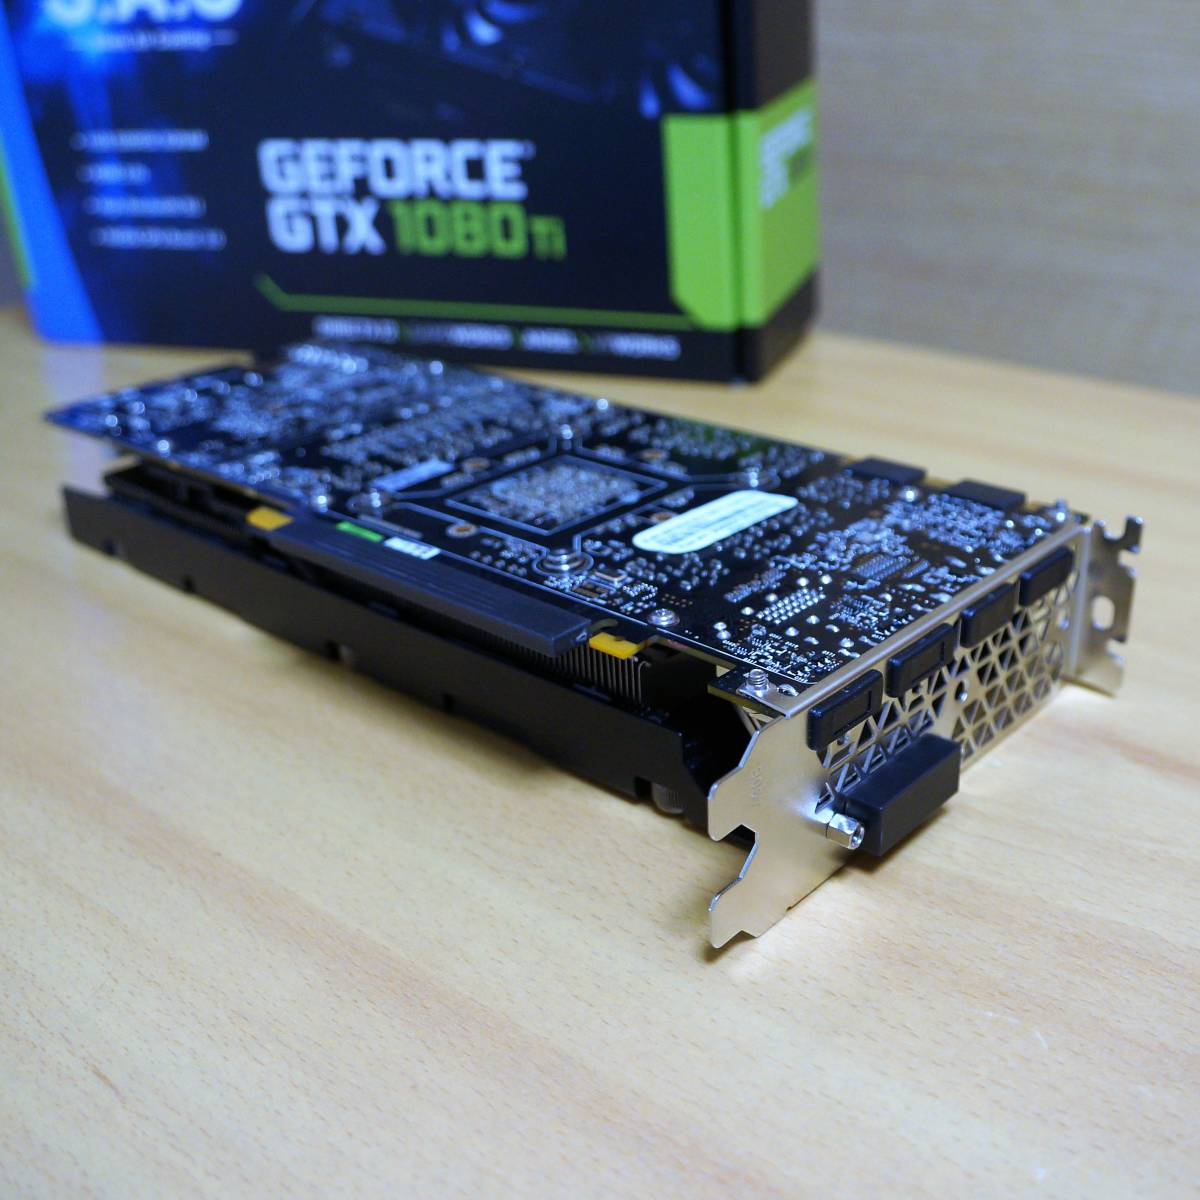 ELSA GeForce GTX 1080Ti 11GB S.A.C GD1080-11GERTS,中古美品、ゲームやマイニングに_画像2